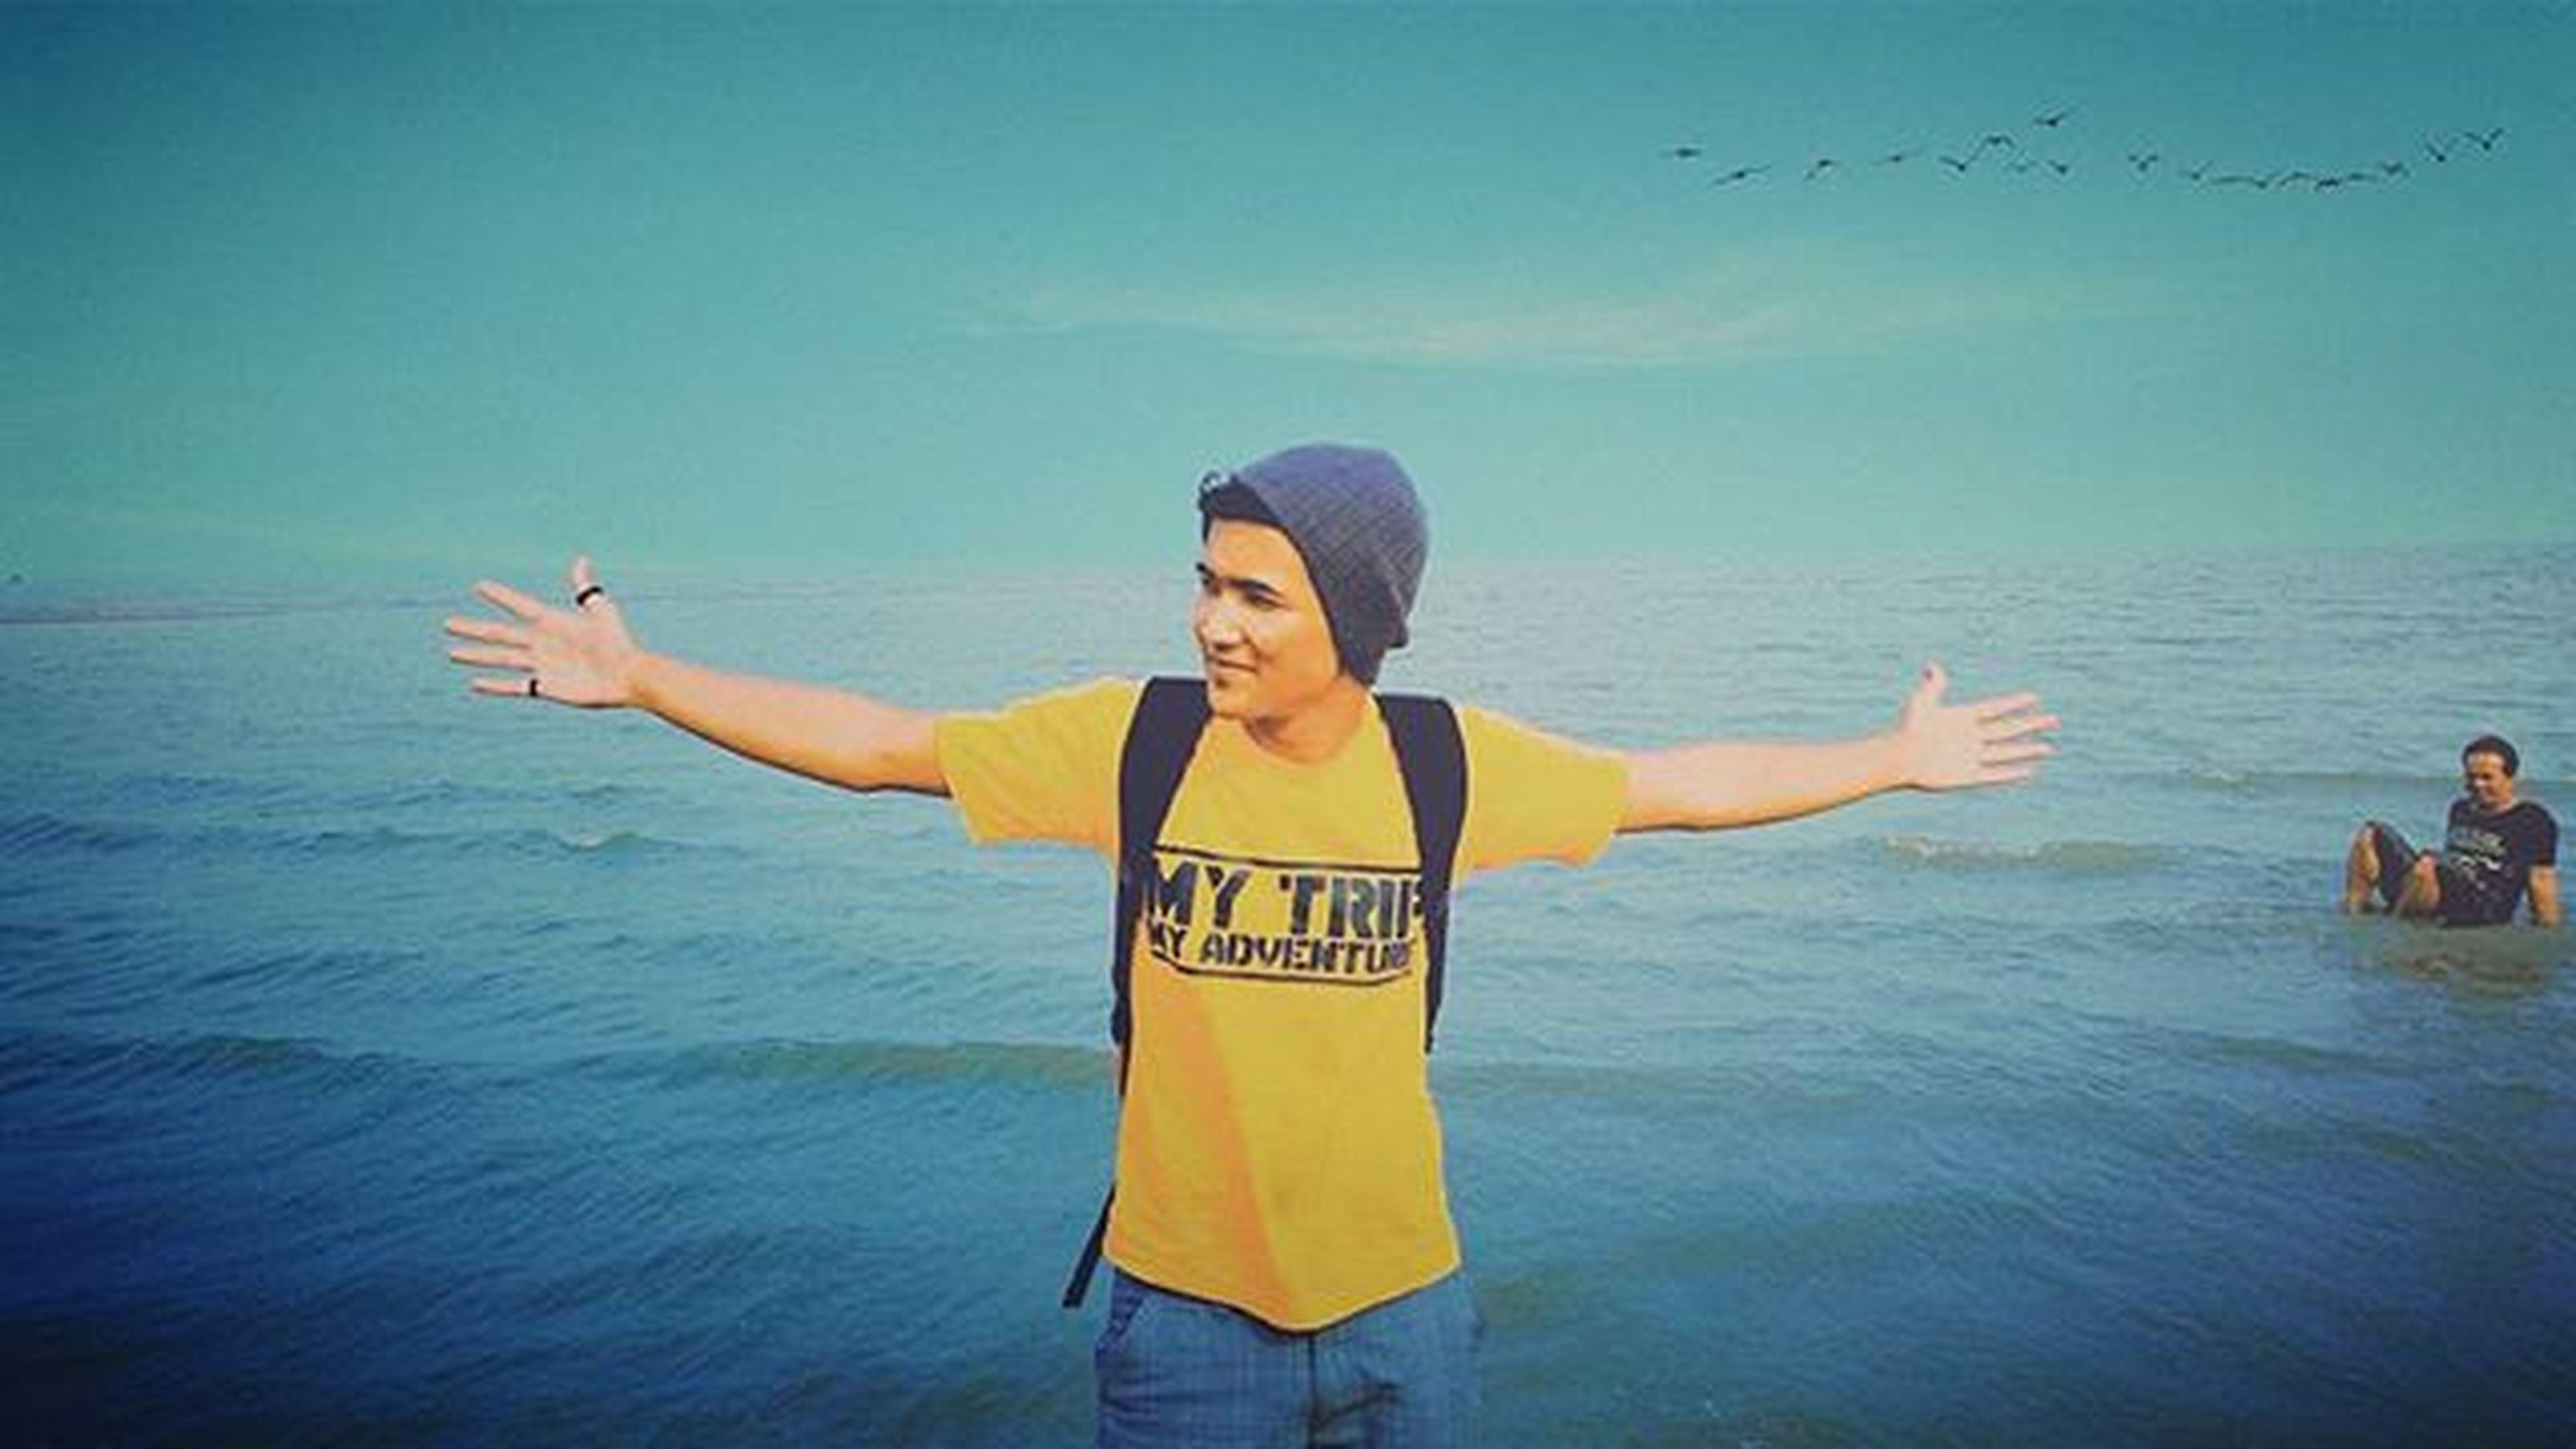 Trip!!! MyTripMyAdventure Beach VSCO VSCO Vintage Vscoedit Muarabadak Sony INDONESIA Instadaily Abadikansetiapmomen Terbaitmeman Jones Sea